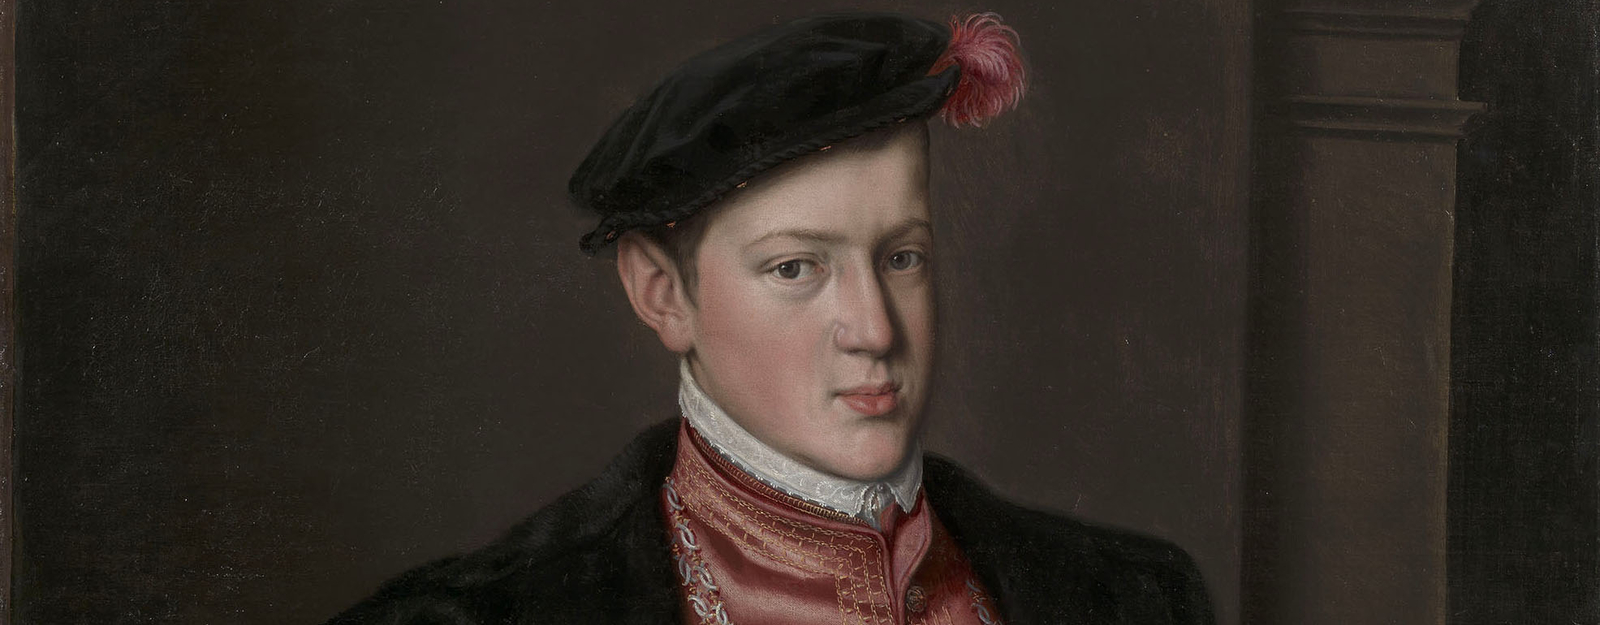 John, Prince of Portugal (1537-54)